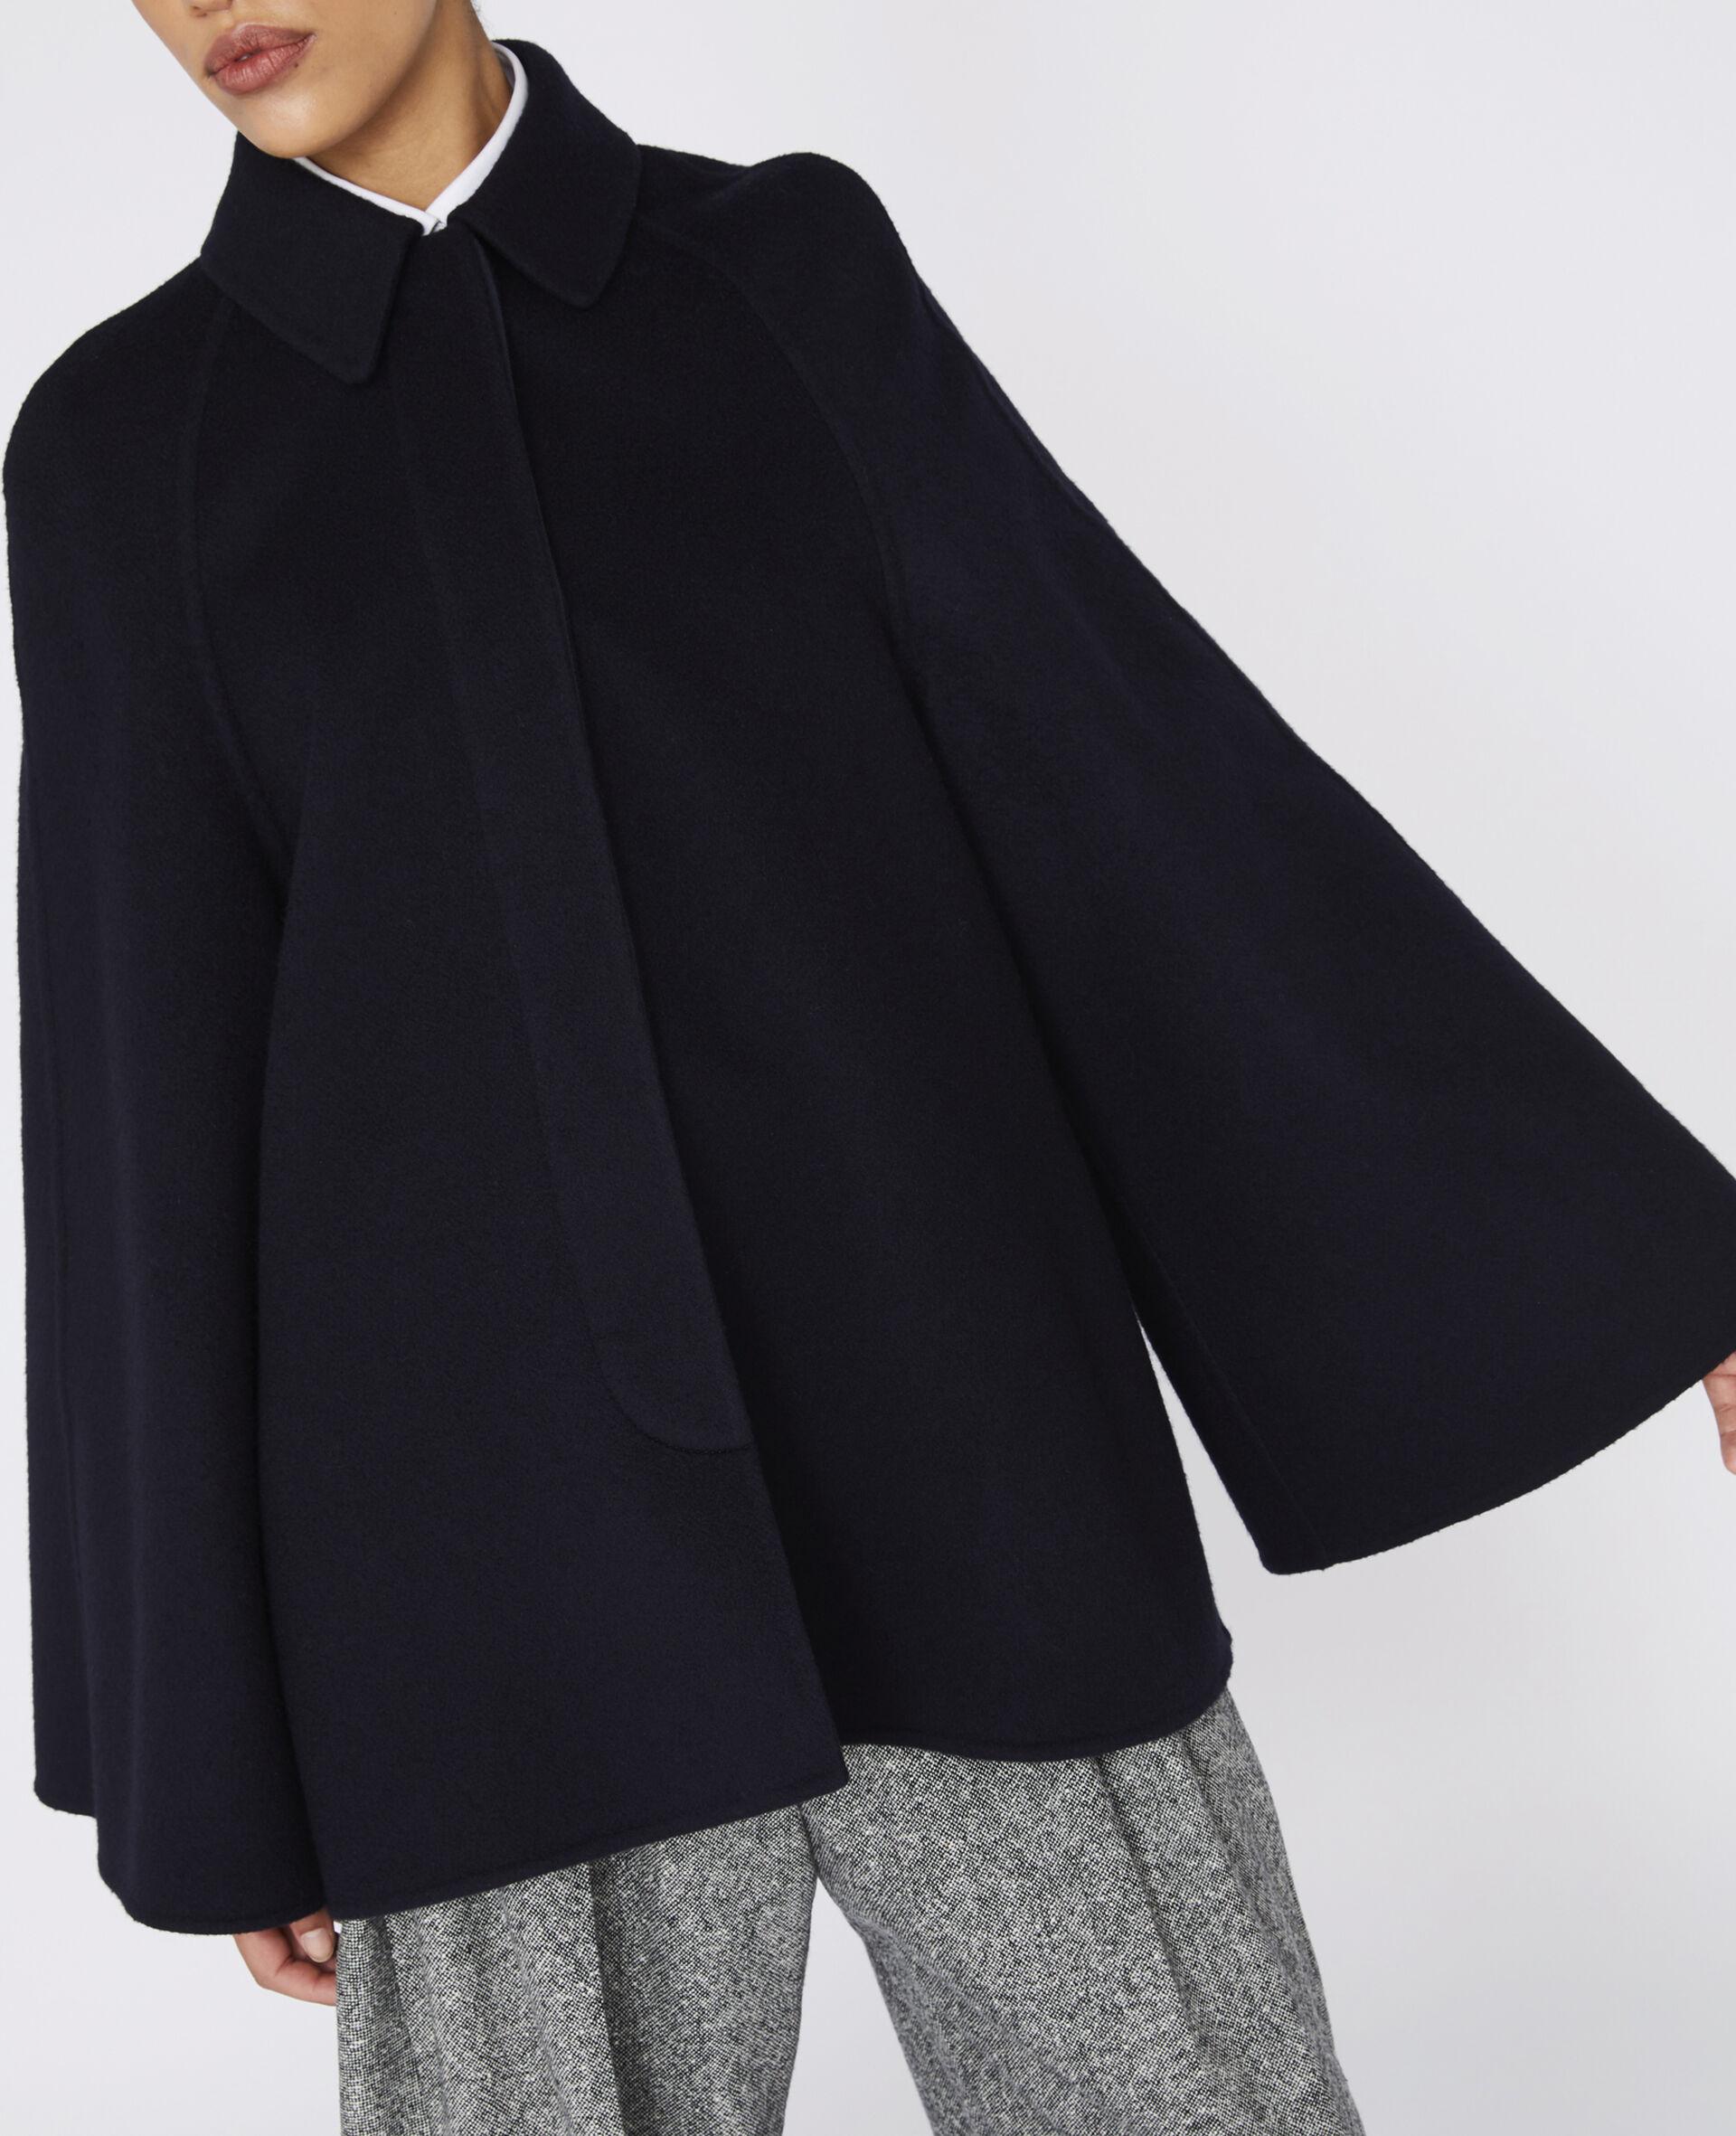 Hose aus Wolle Dawson-Grau-large image number 3